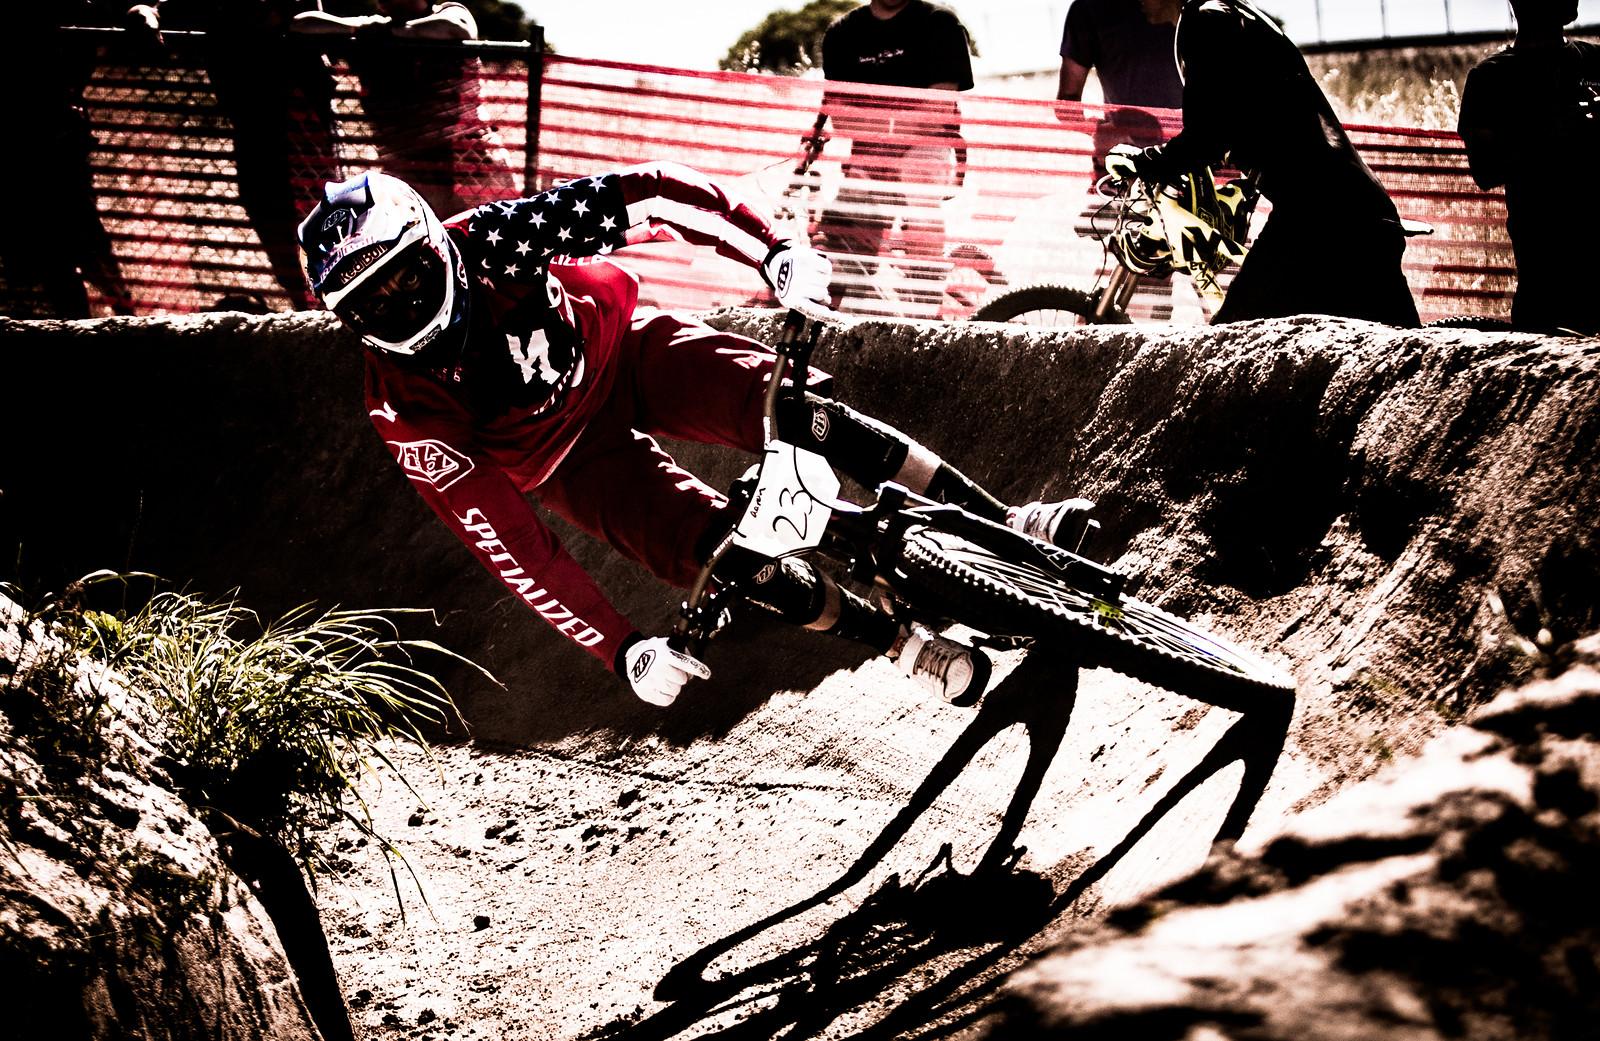 Aaron Gwin - svmayor - Mountain Biking Pictures - Vital MTB